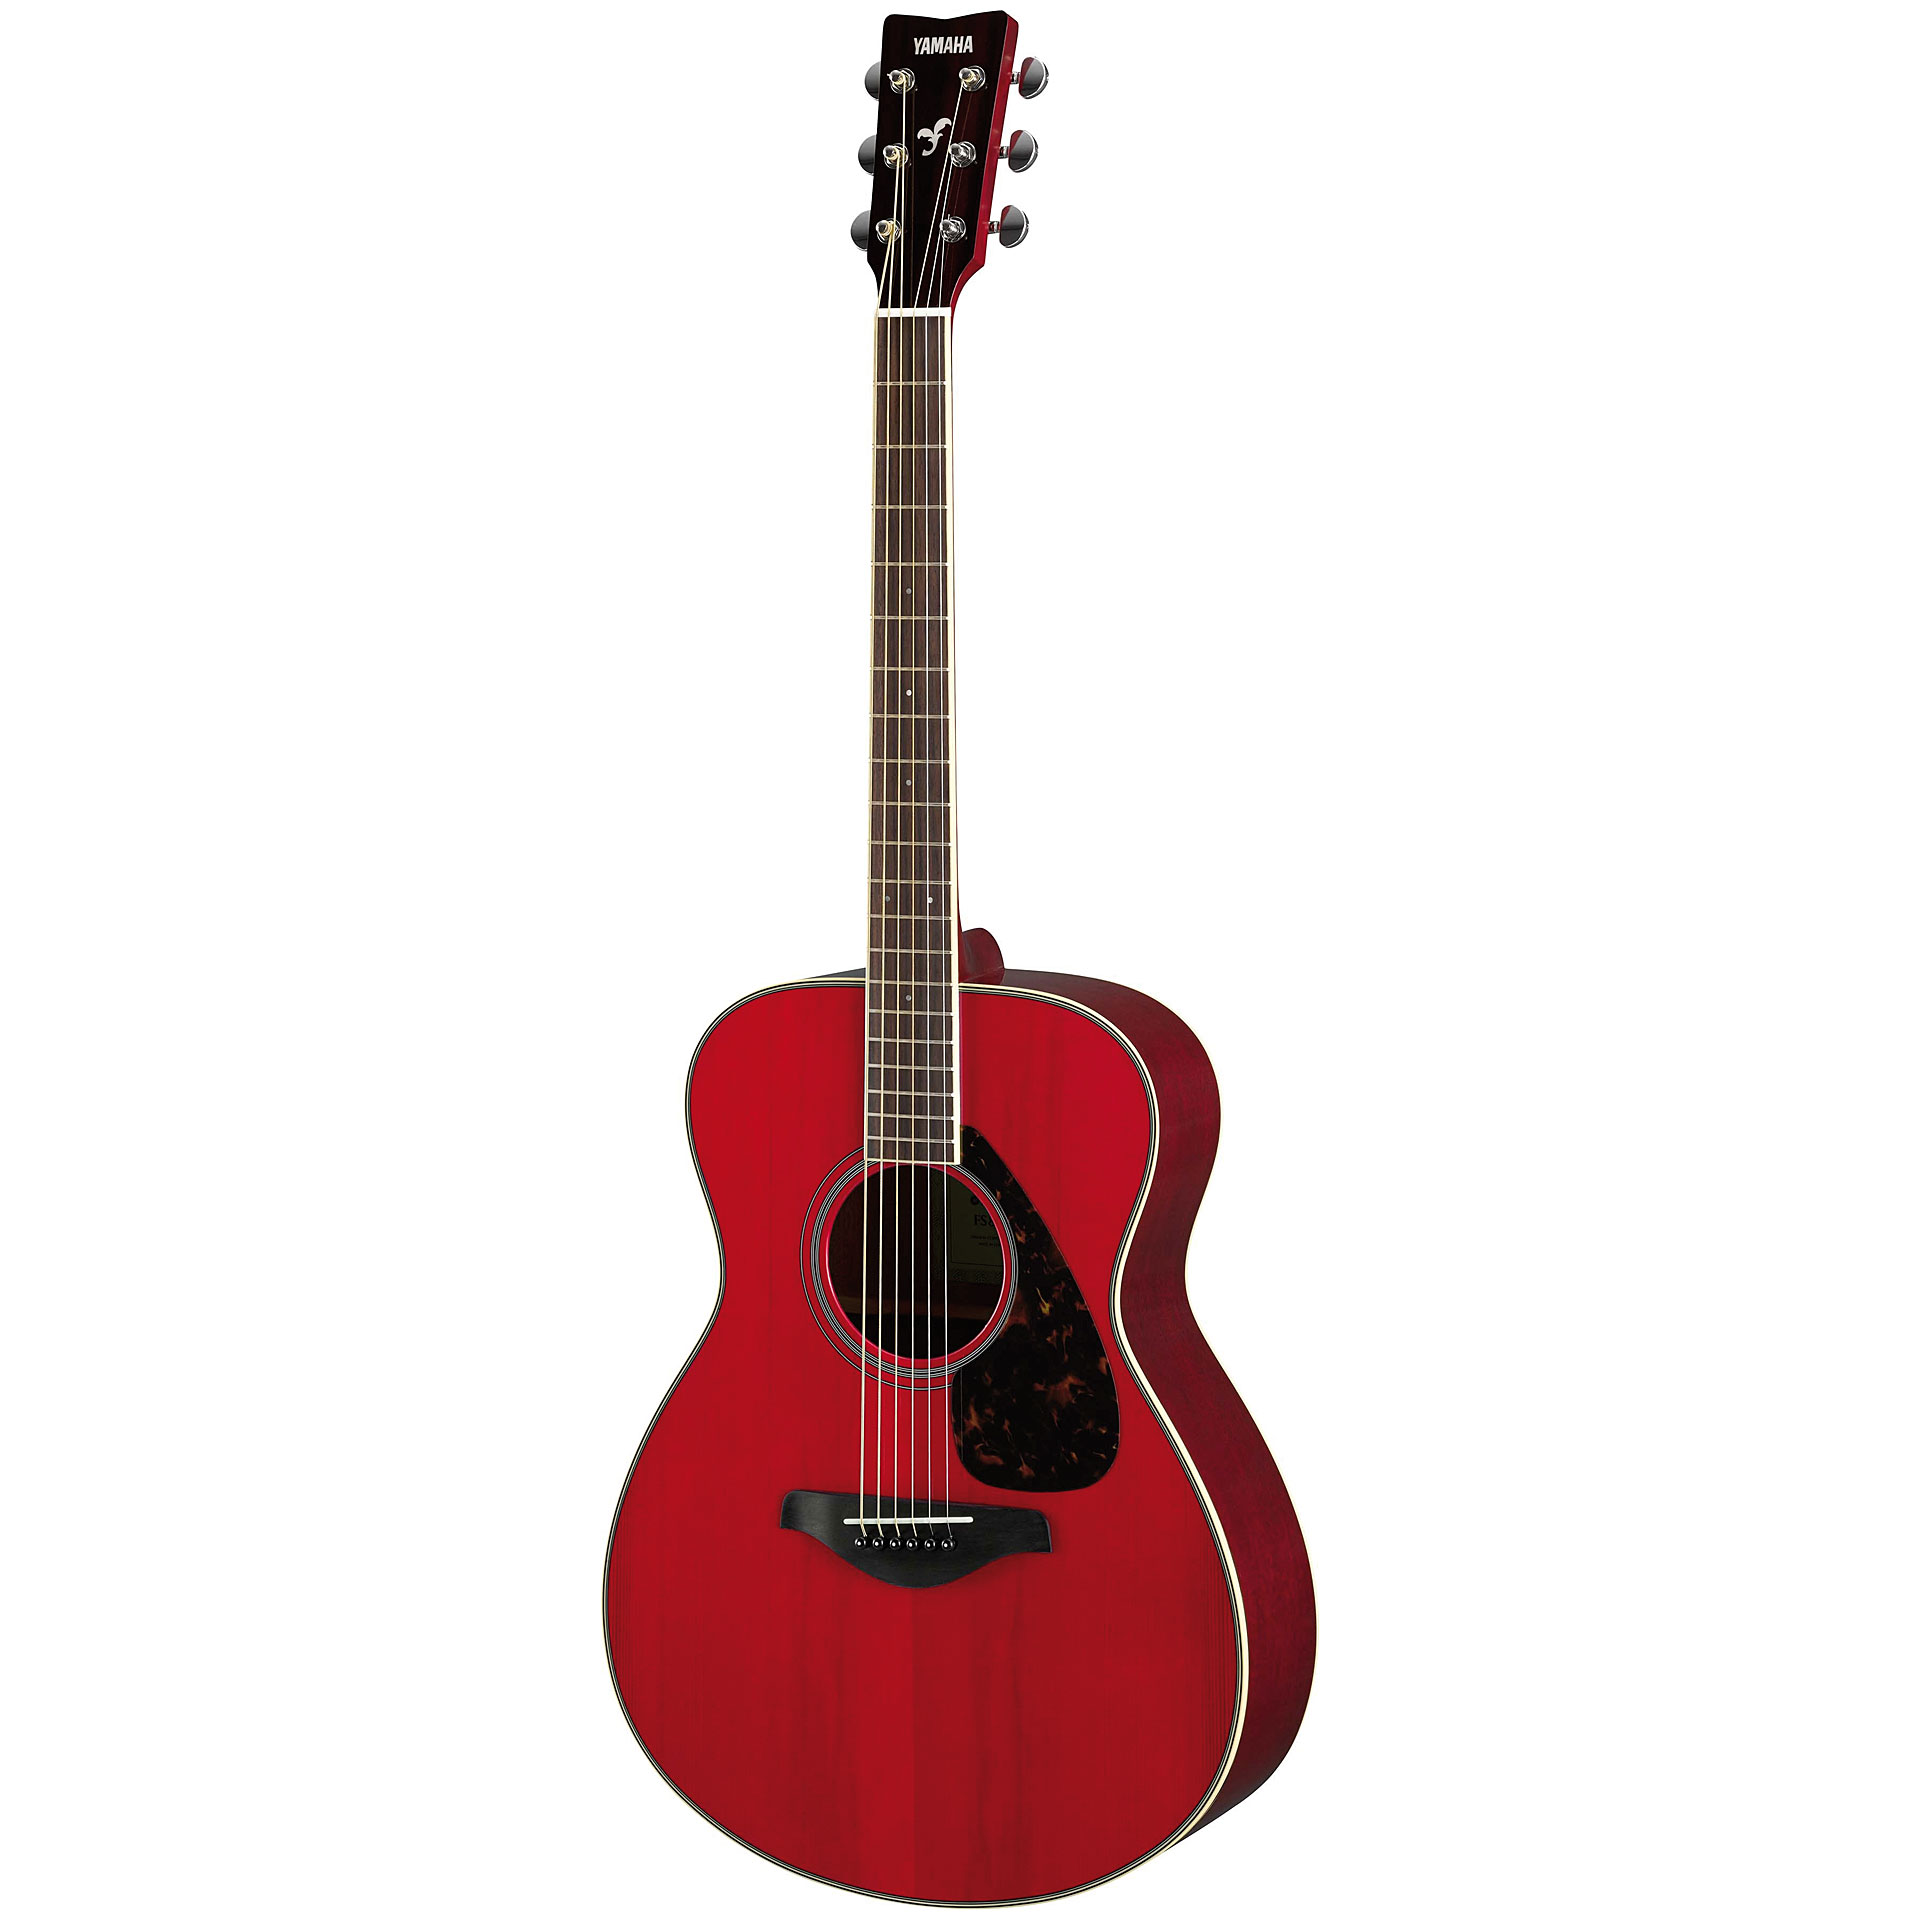 Yamaha Fgs  String Folk Acoustic Guitar